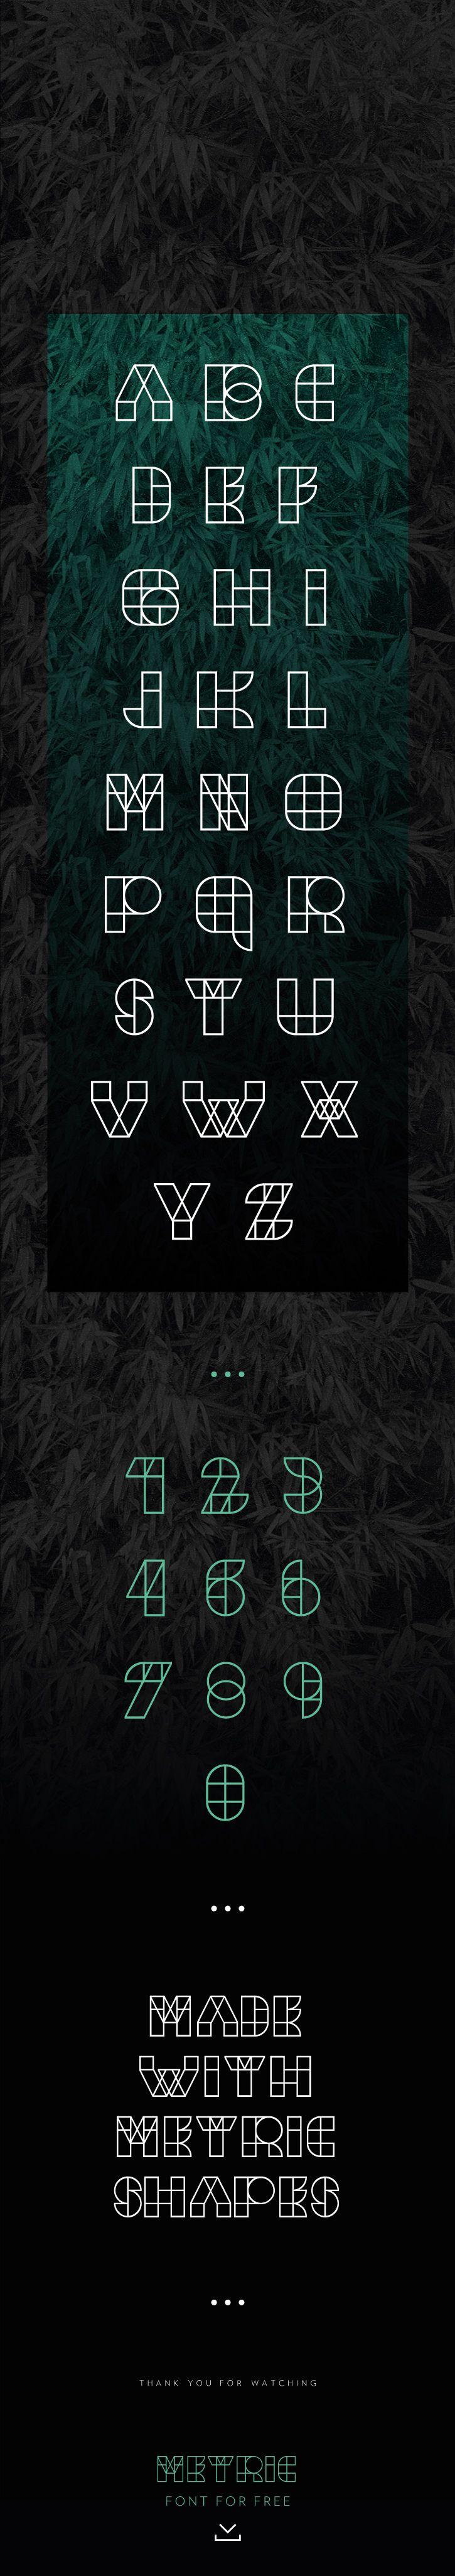 Metric Typography / Free Font